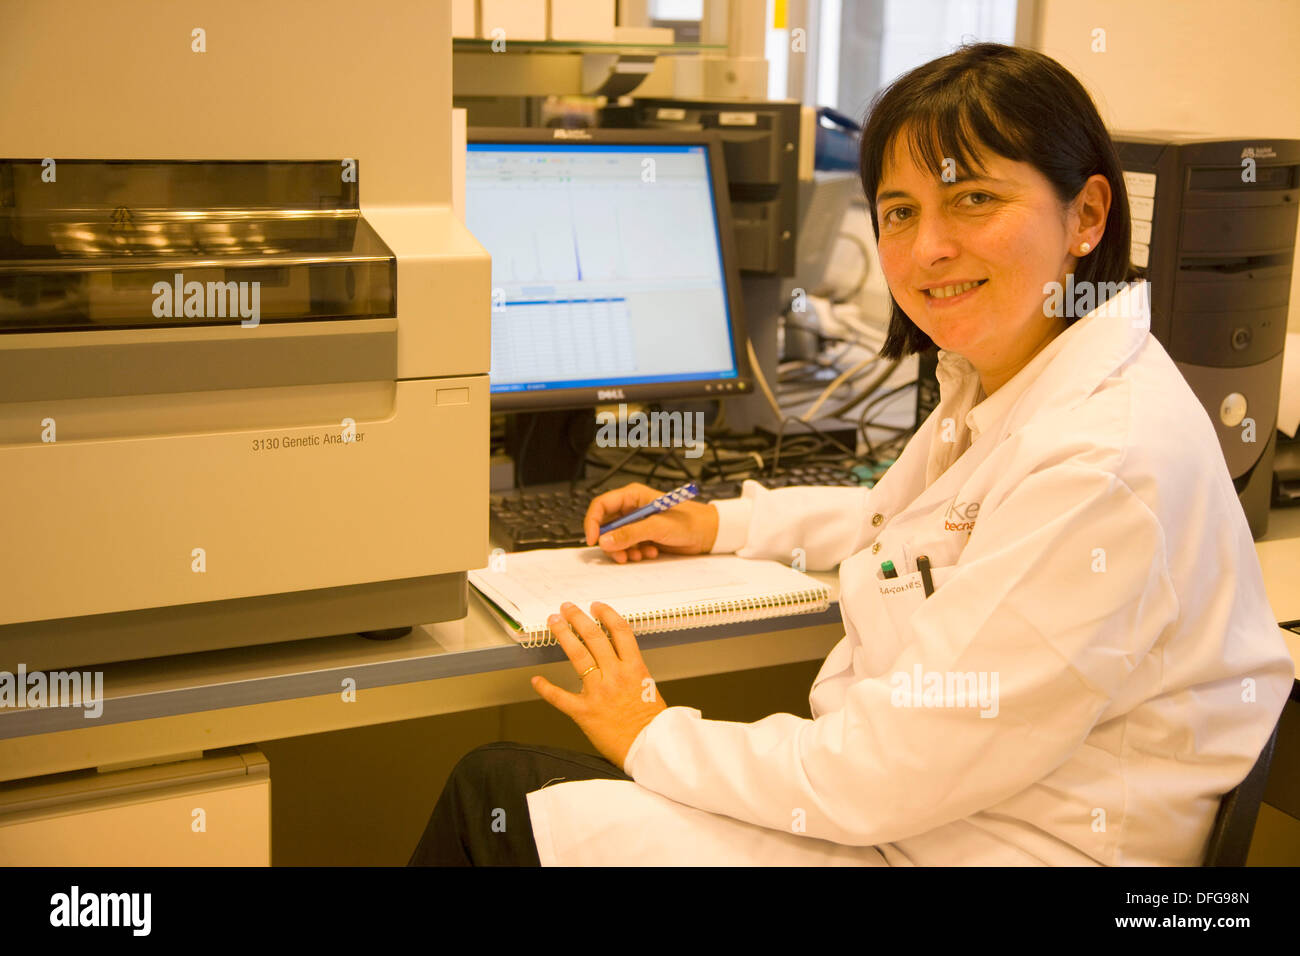 Varietal Identification using Microsatellites, Capillary electrophoresis-ABI, Biotechnology Laboratory, Neiker Tecnalia, - Stock Image